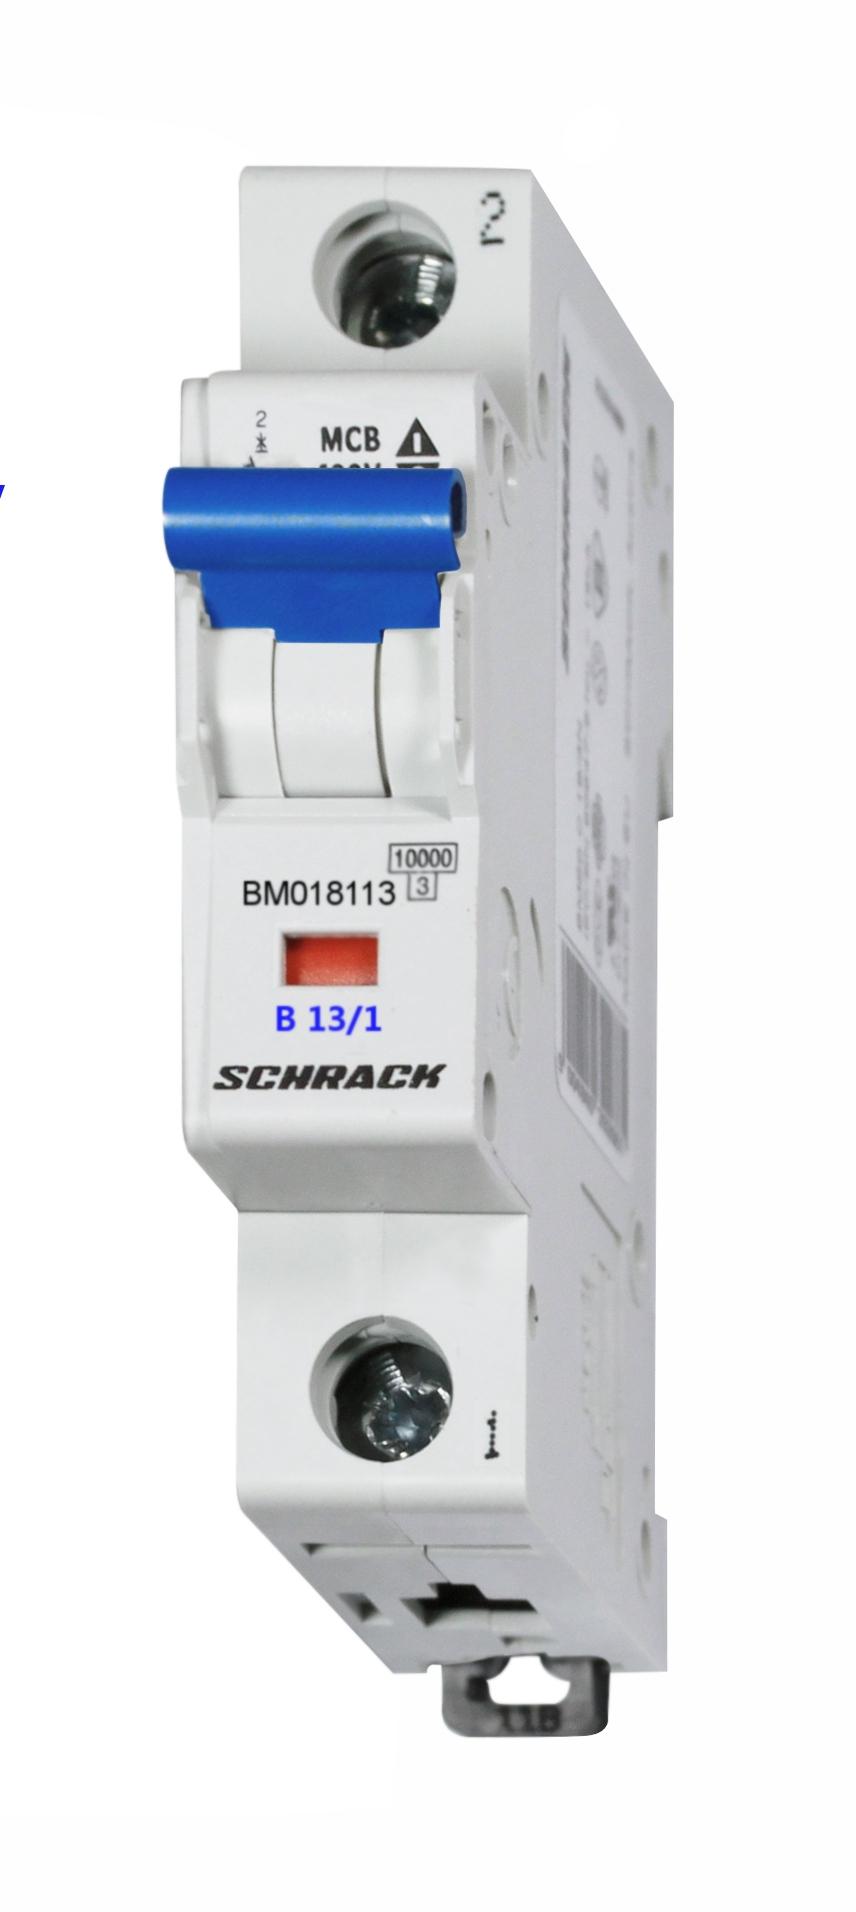 BM018113 - Schrack Technik